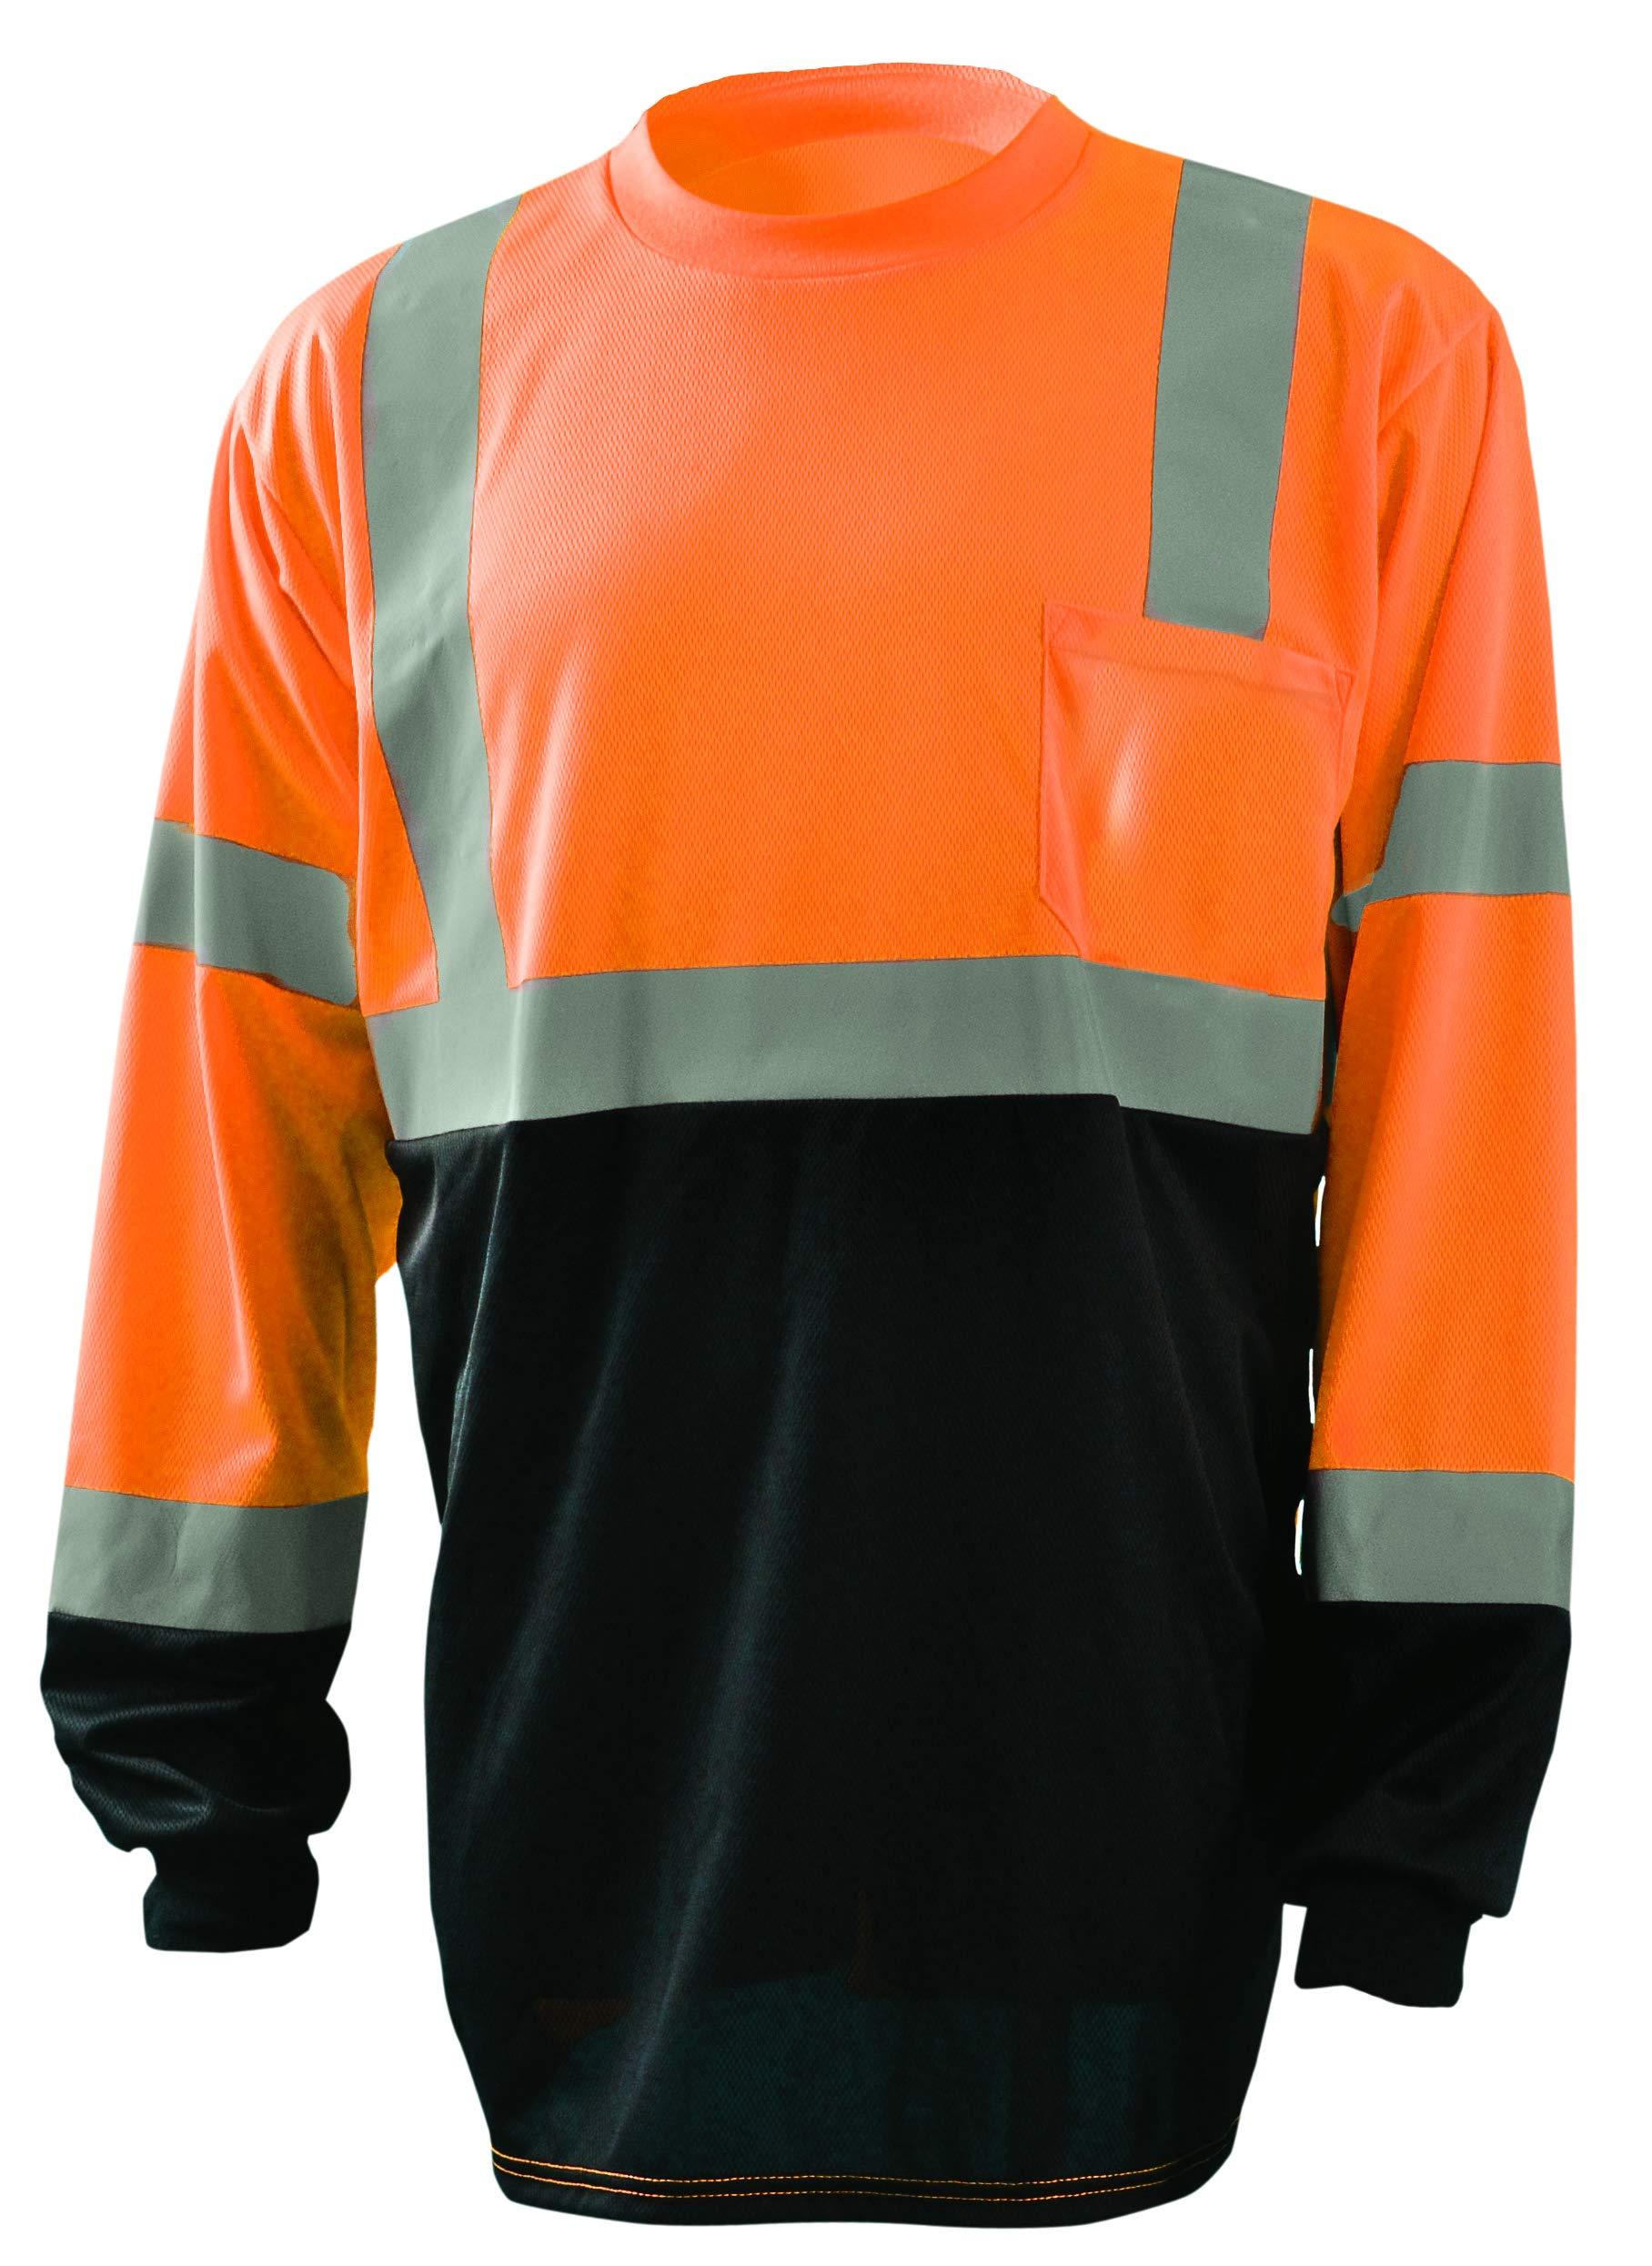 OccuNomix LUX-LSETPBK-OXL Classic Standard Long Sleeve Wicking Birdseye Black Bottom T-Shirt, Class 3, 100% ANSI Wicking Polyester Birdseye, X-Large, Orange (High Visibility)